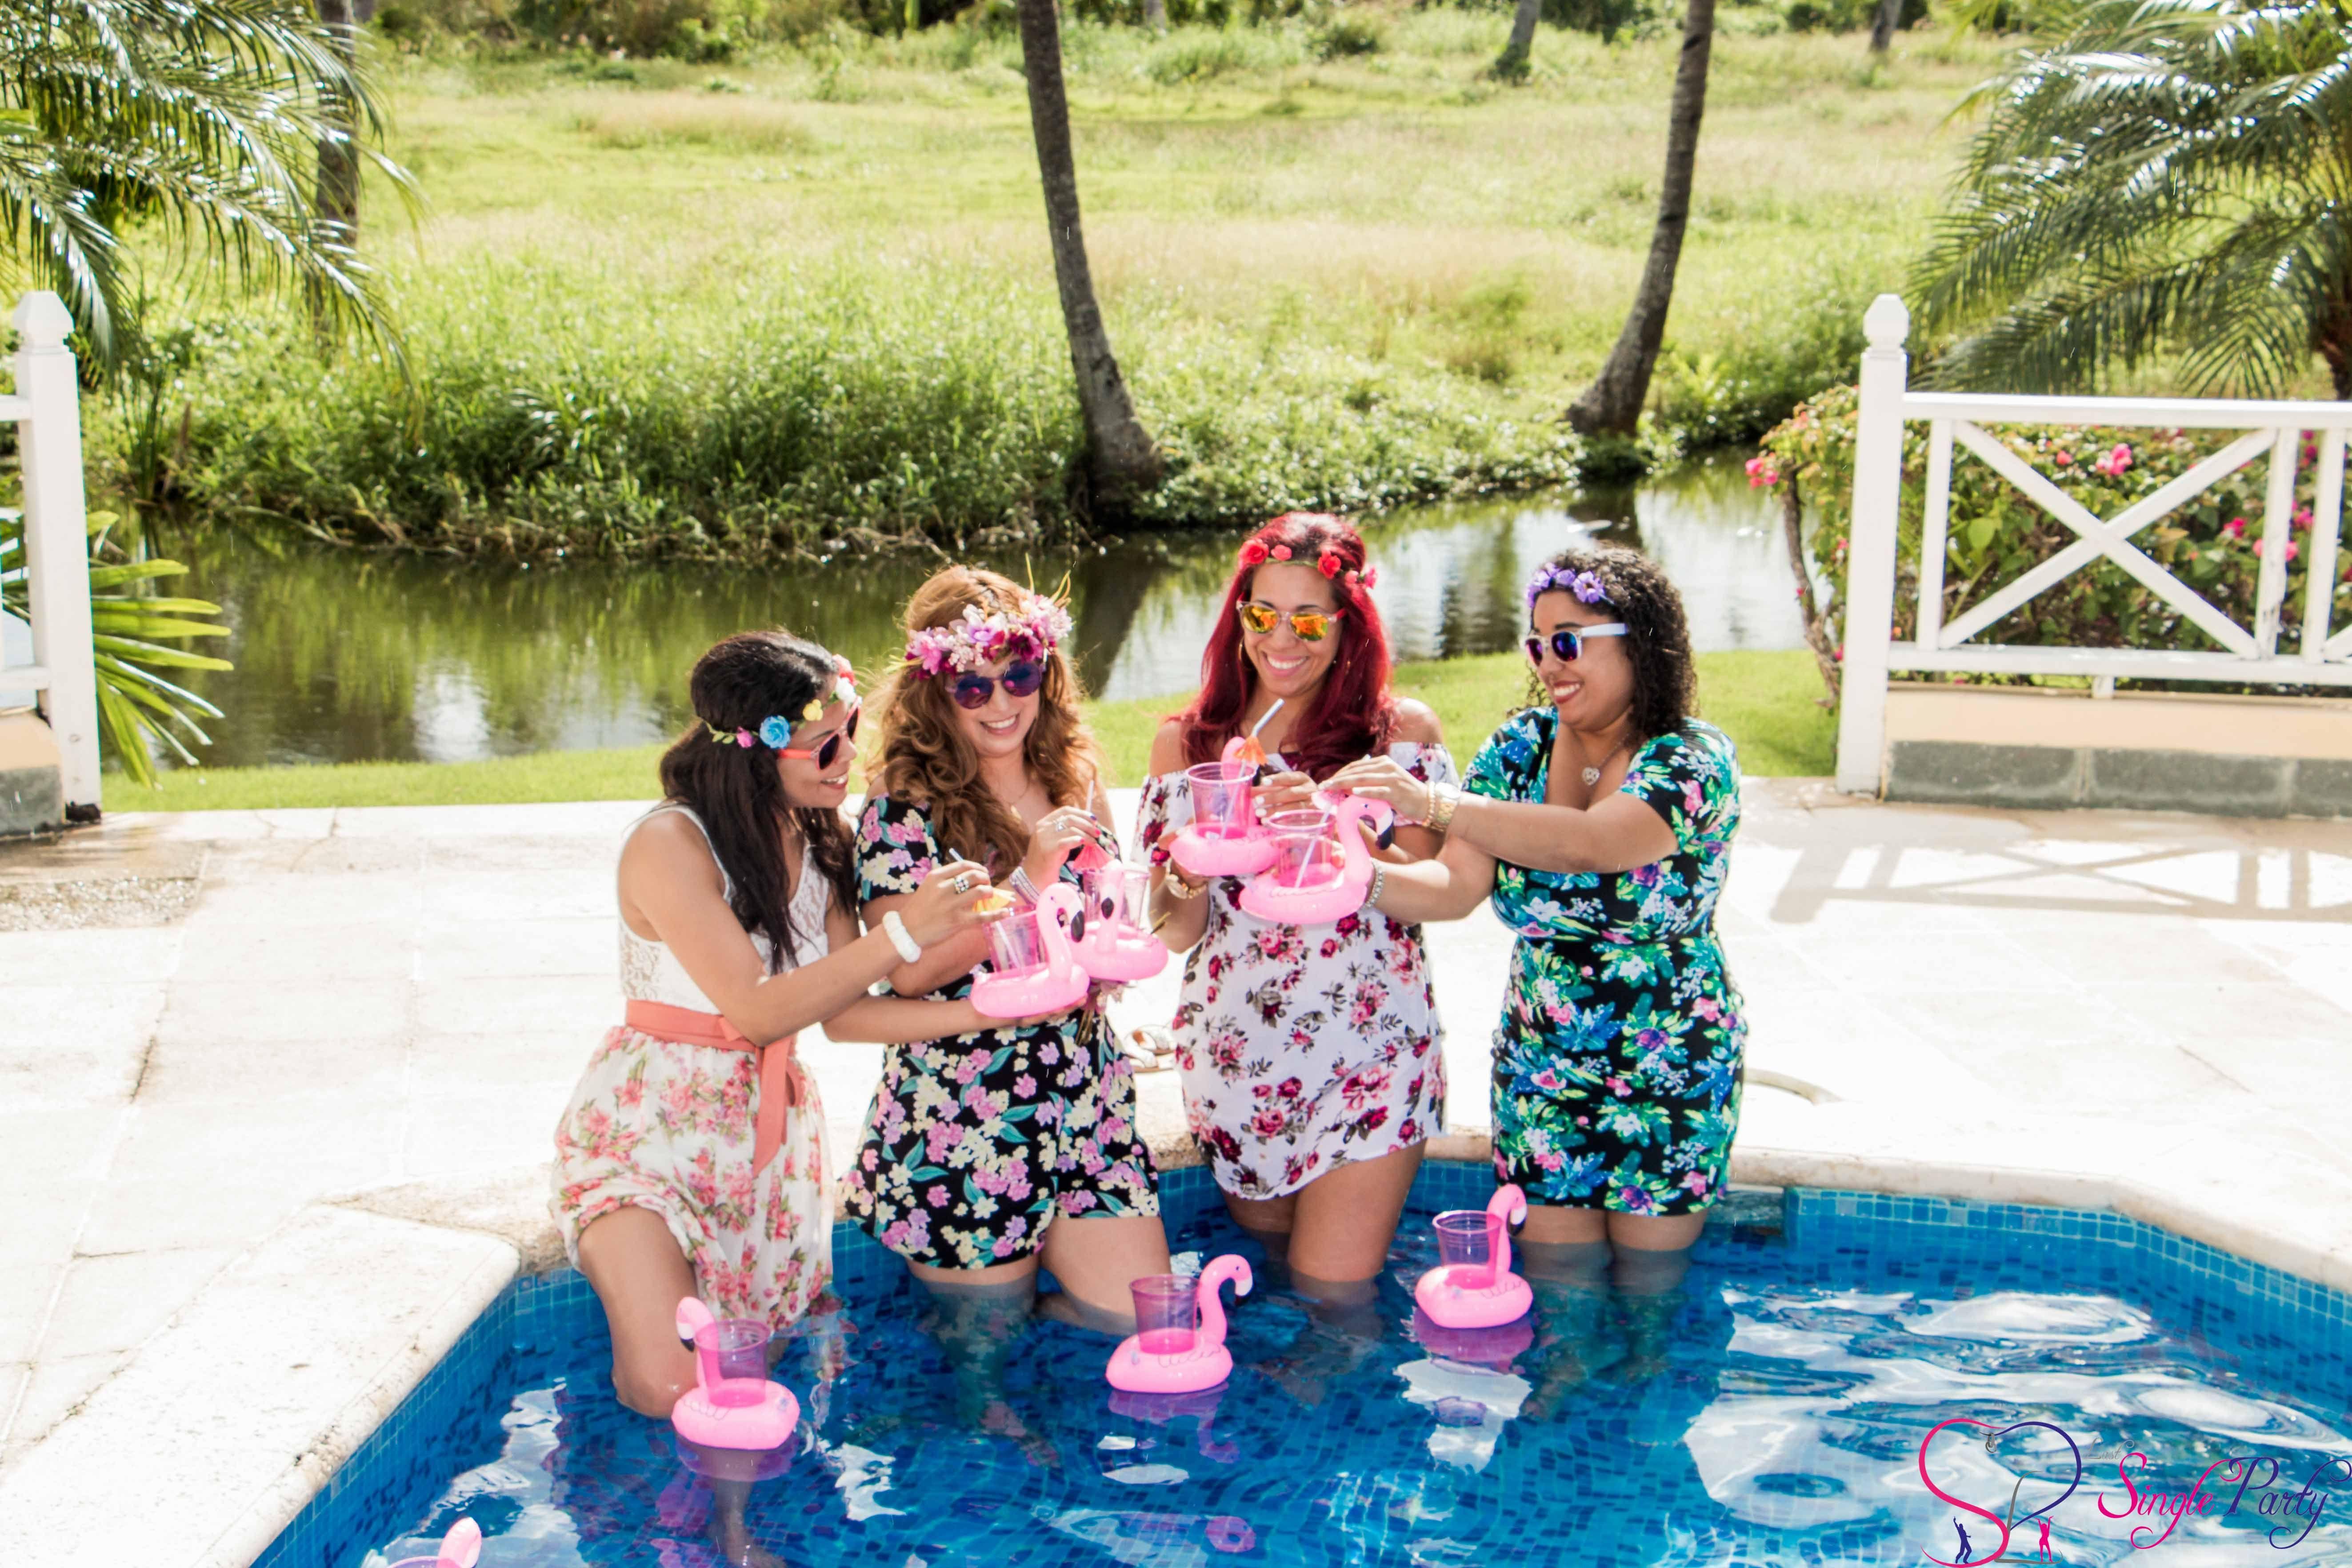 Pool Party Bachelorette Party Bachelor Party Bavaro Punta Cana Dominican Republic Lastsinglepart Bachelor Party Bachelorette Party Pool Party Bachelorette